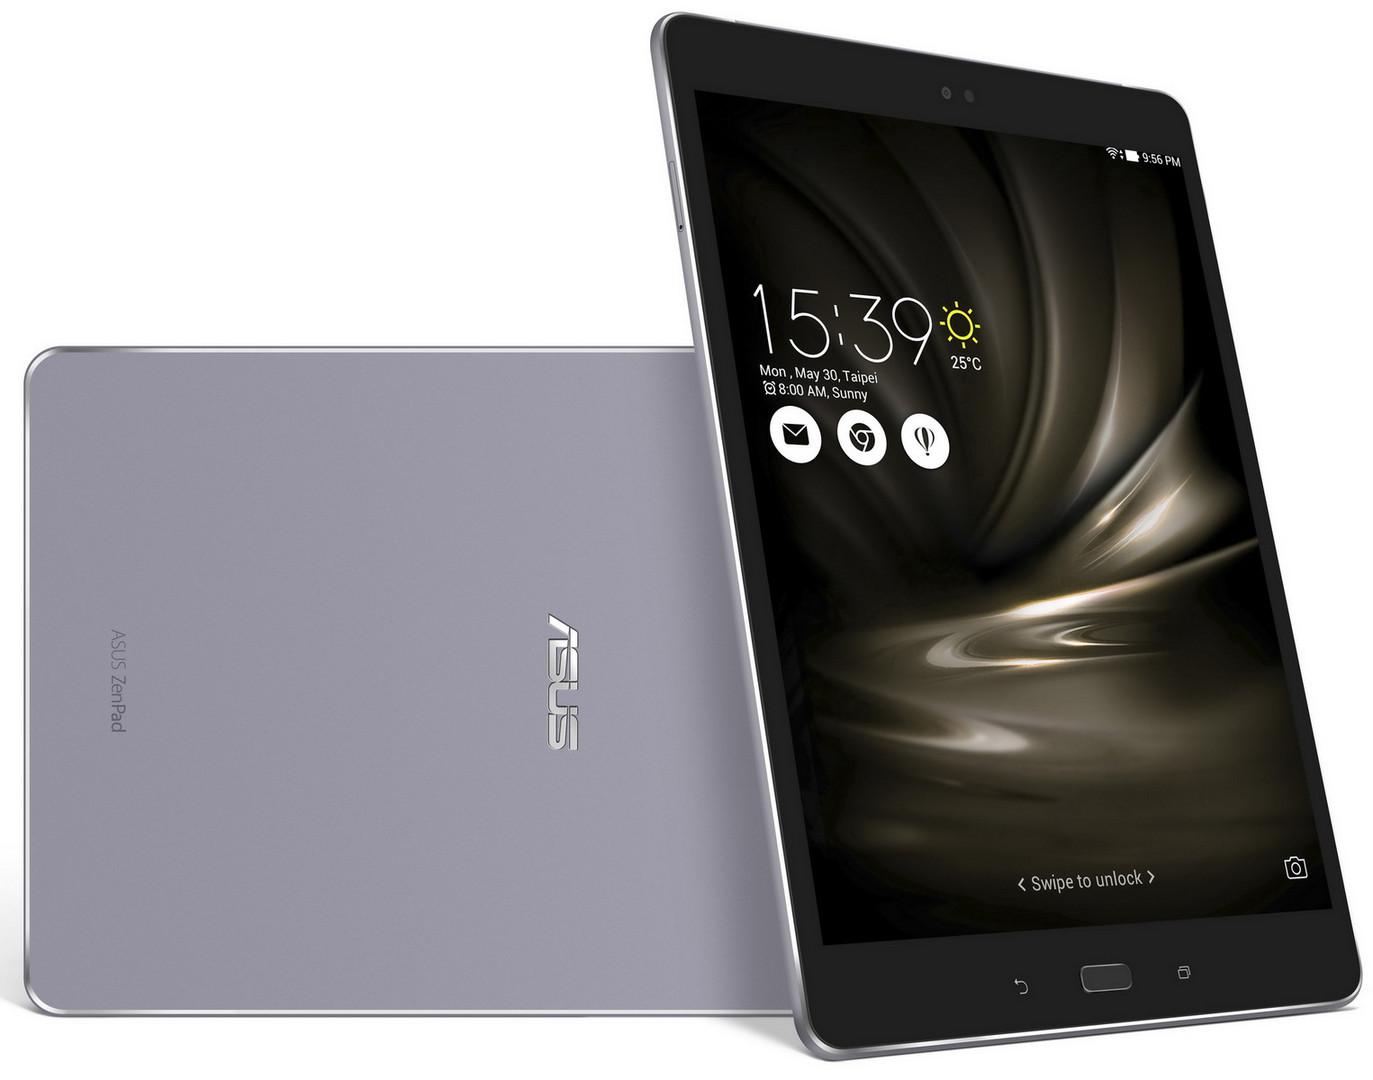 Test Asus ZenPad 3S 10 LTE (Z500KL) Tablet